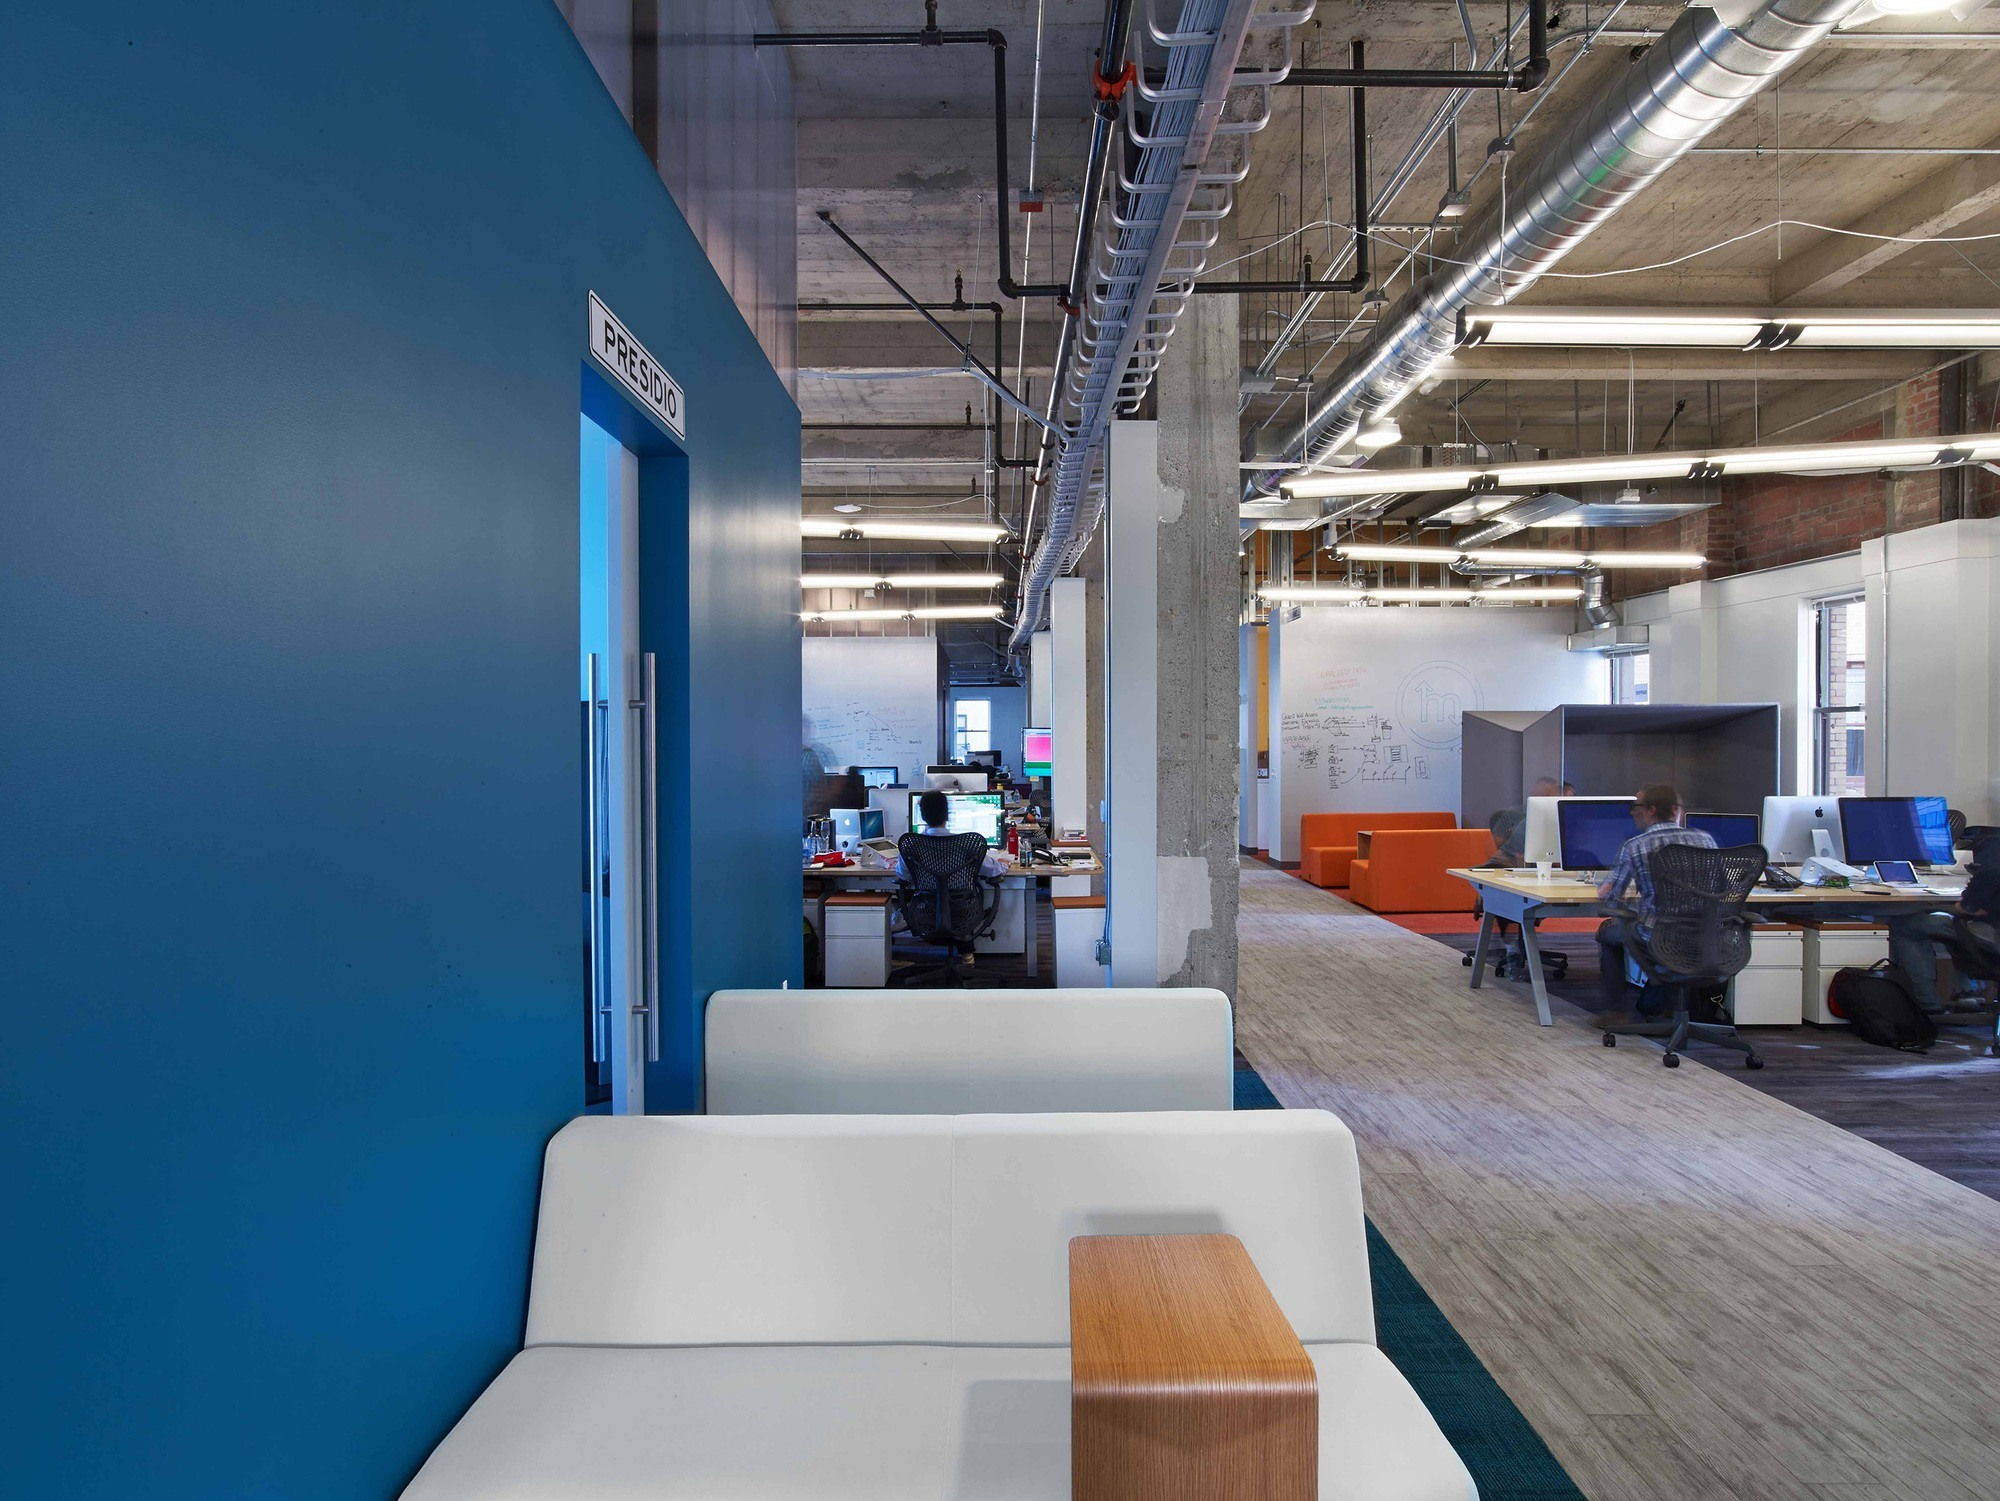 Expedias San Francisco Offices By Rapt Studio Officelovin